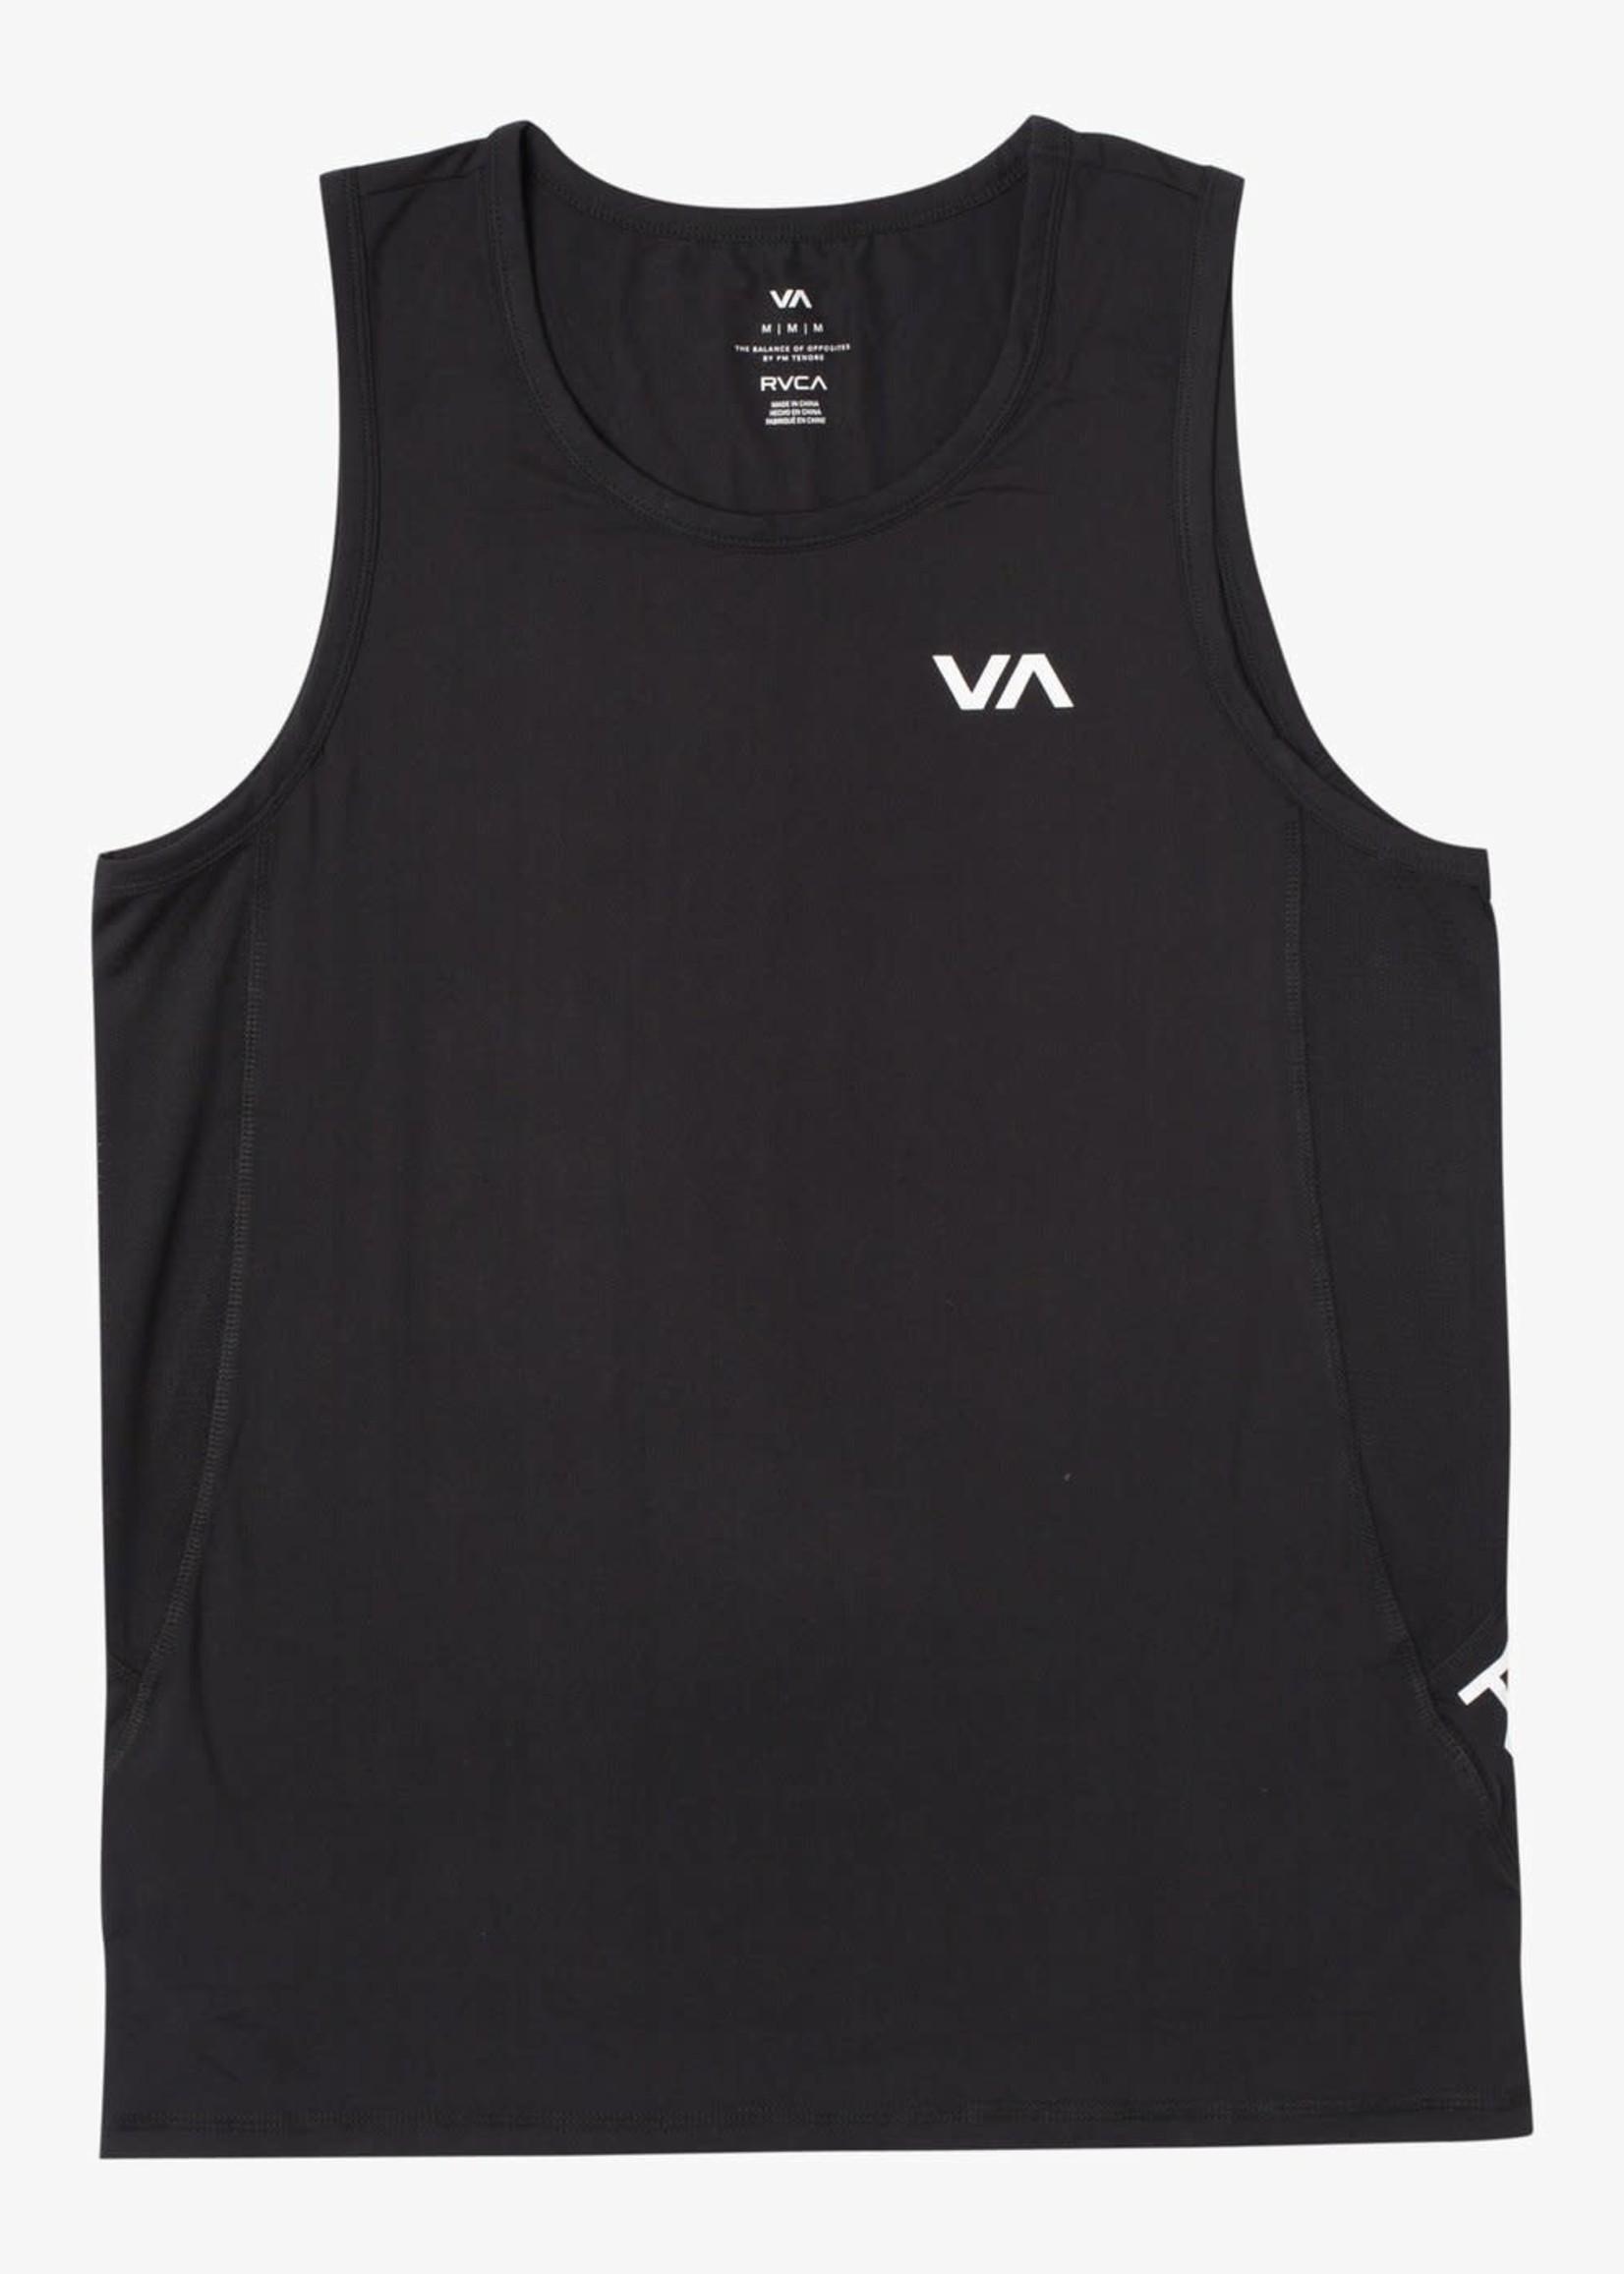 RVCA Sport Vent Tank Top